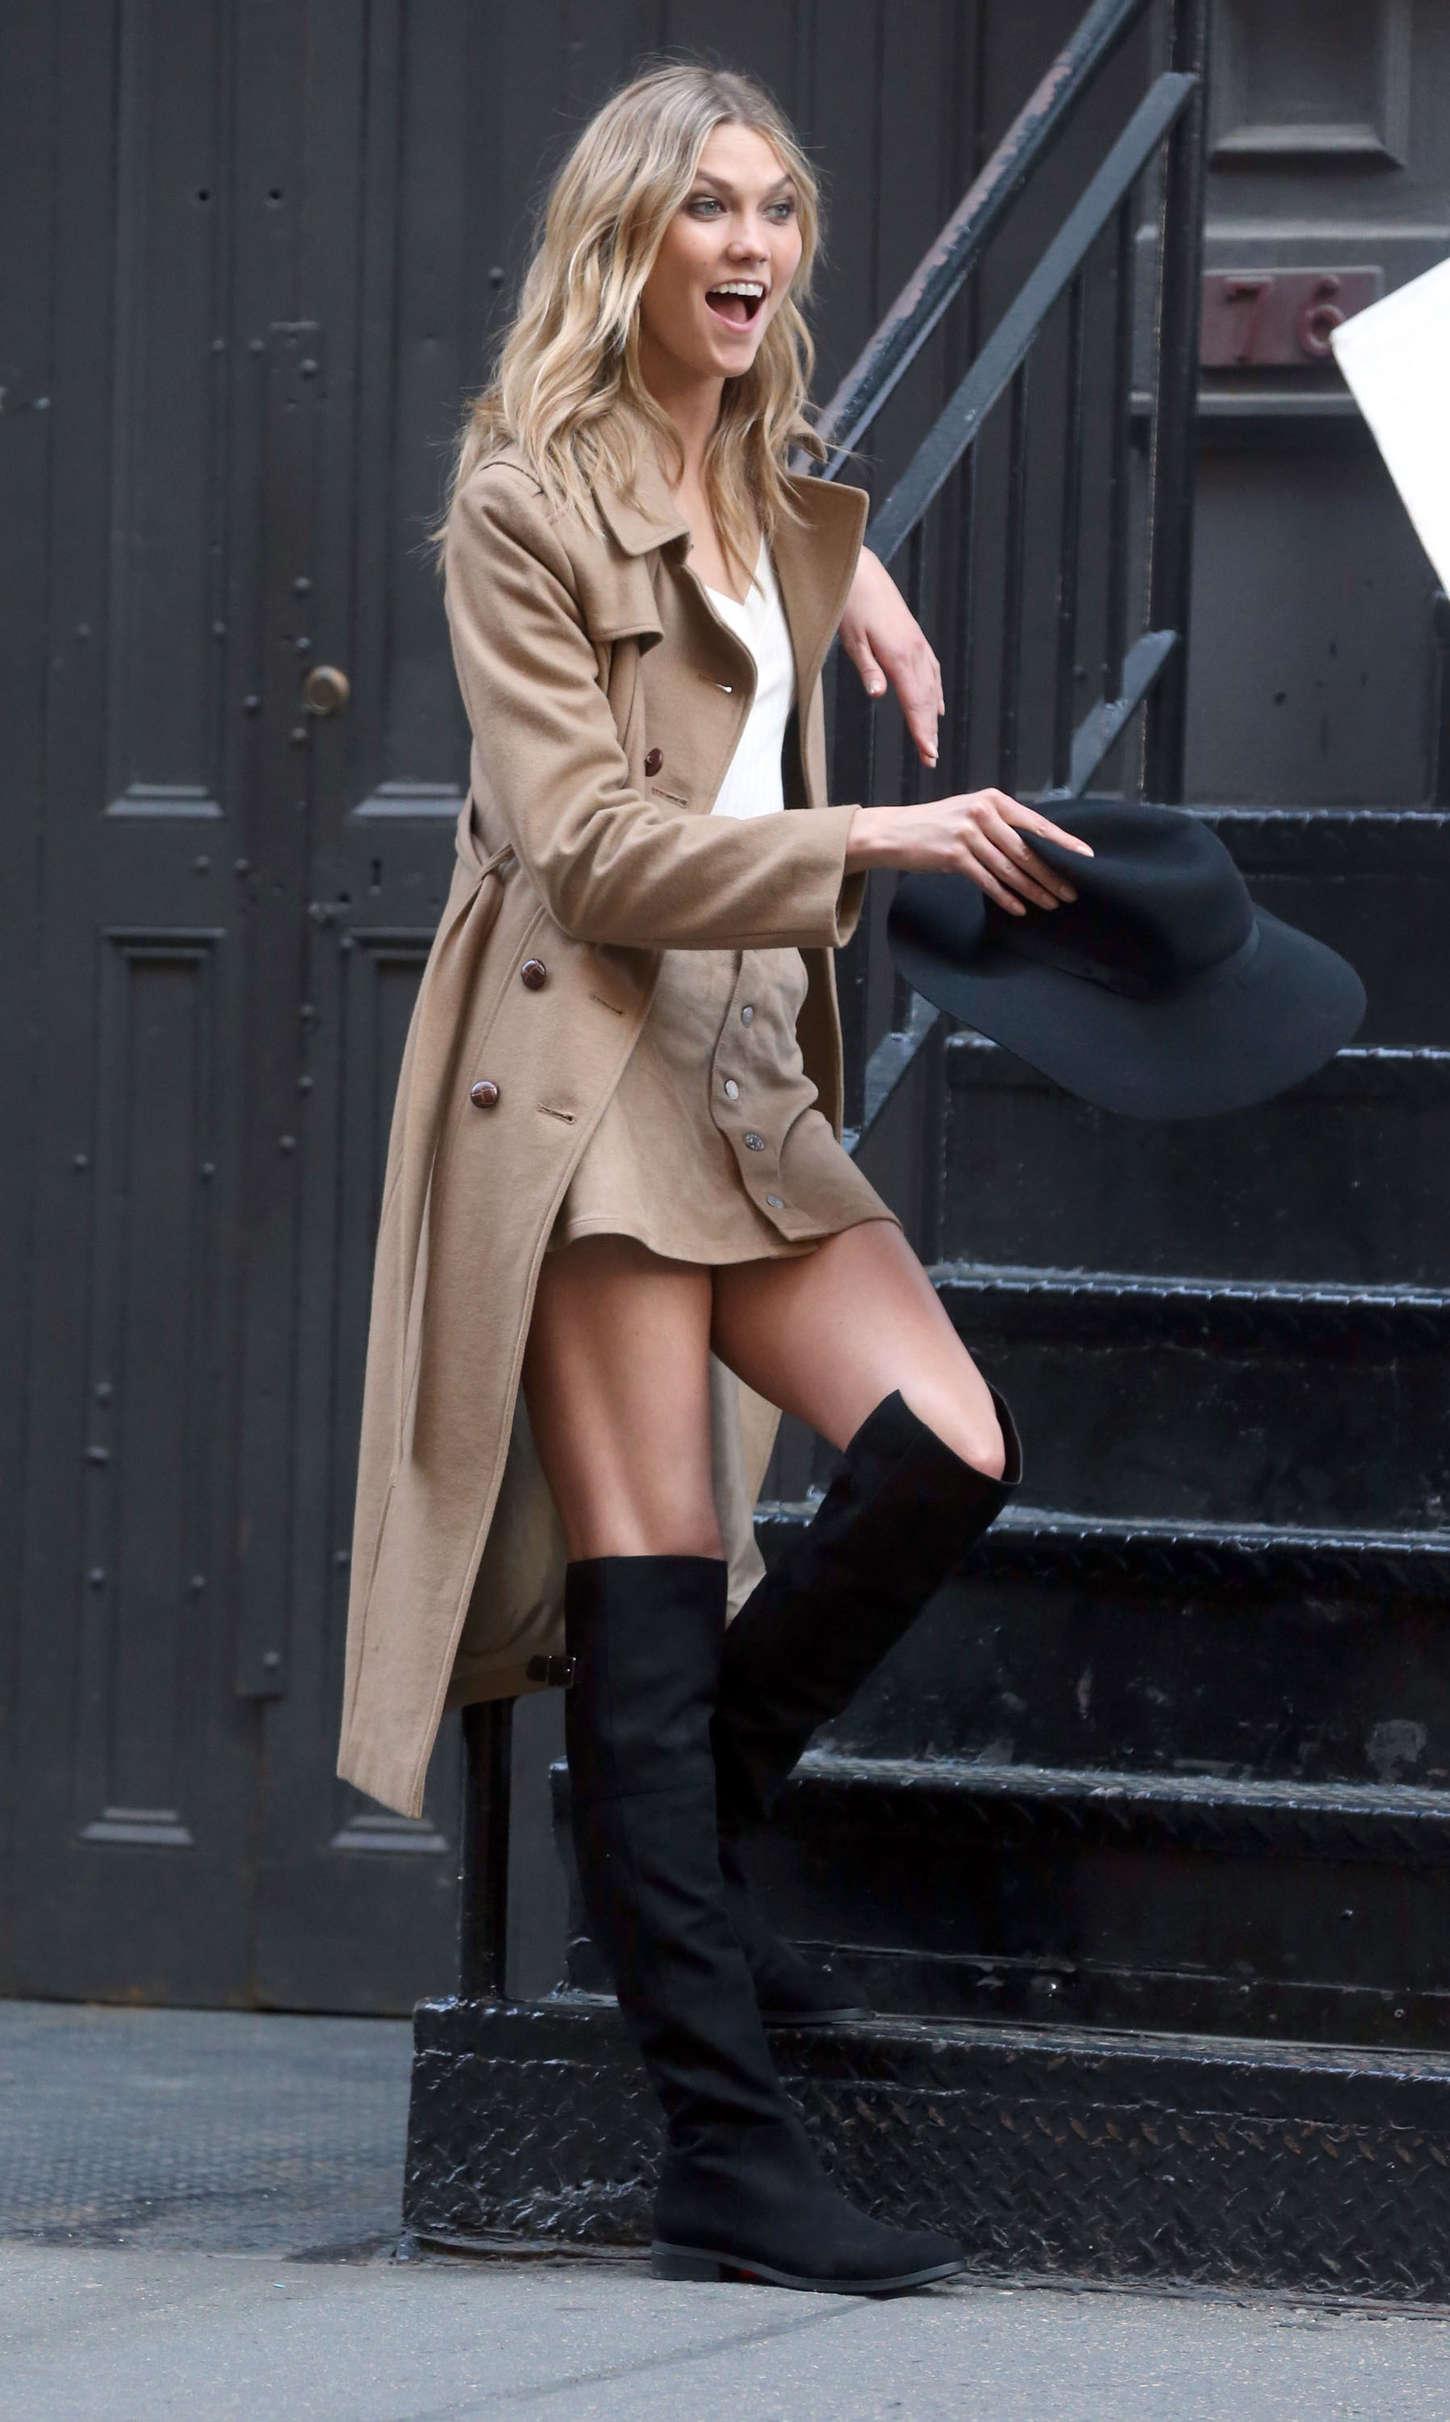 Karlie Kloss 2015 : Karlie Kloss: Photoshoot in NYC -35